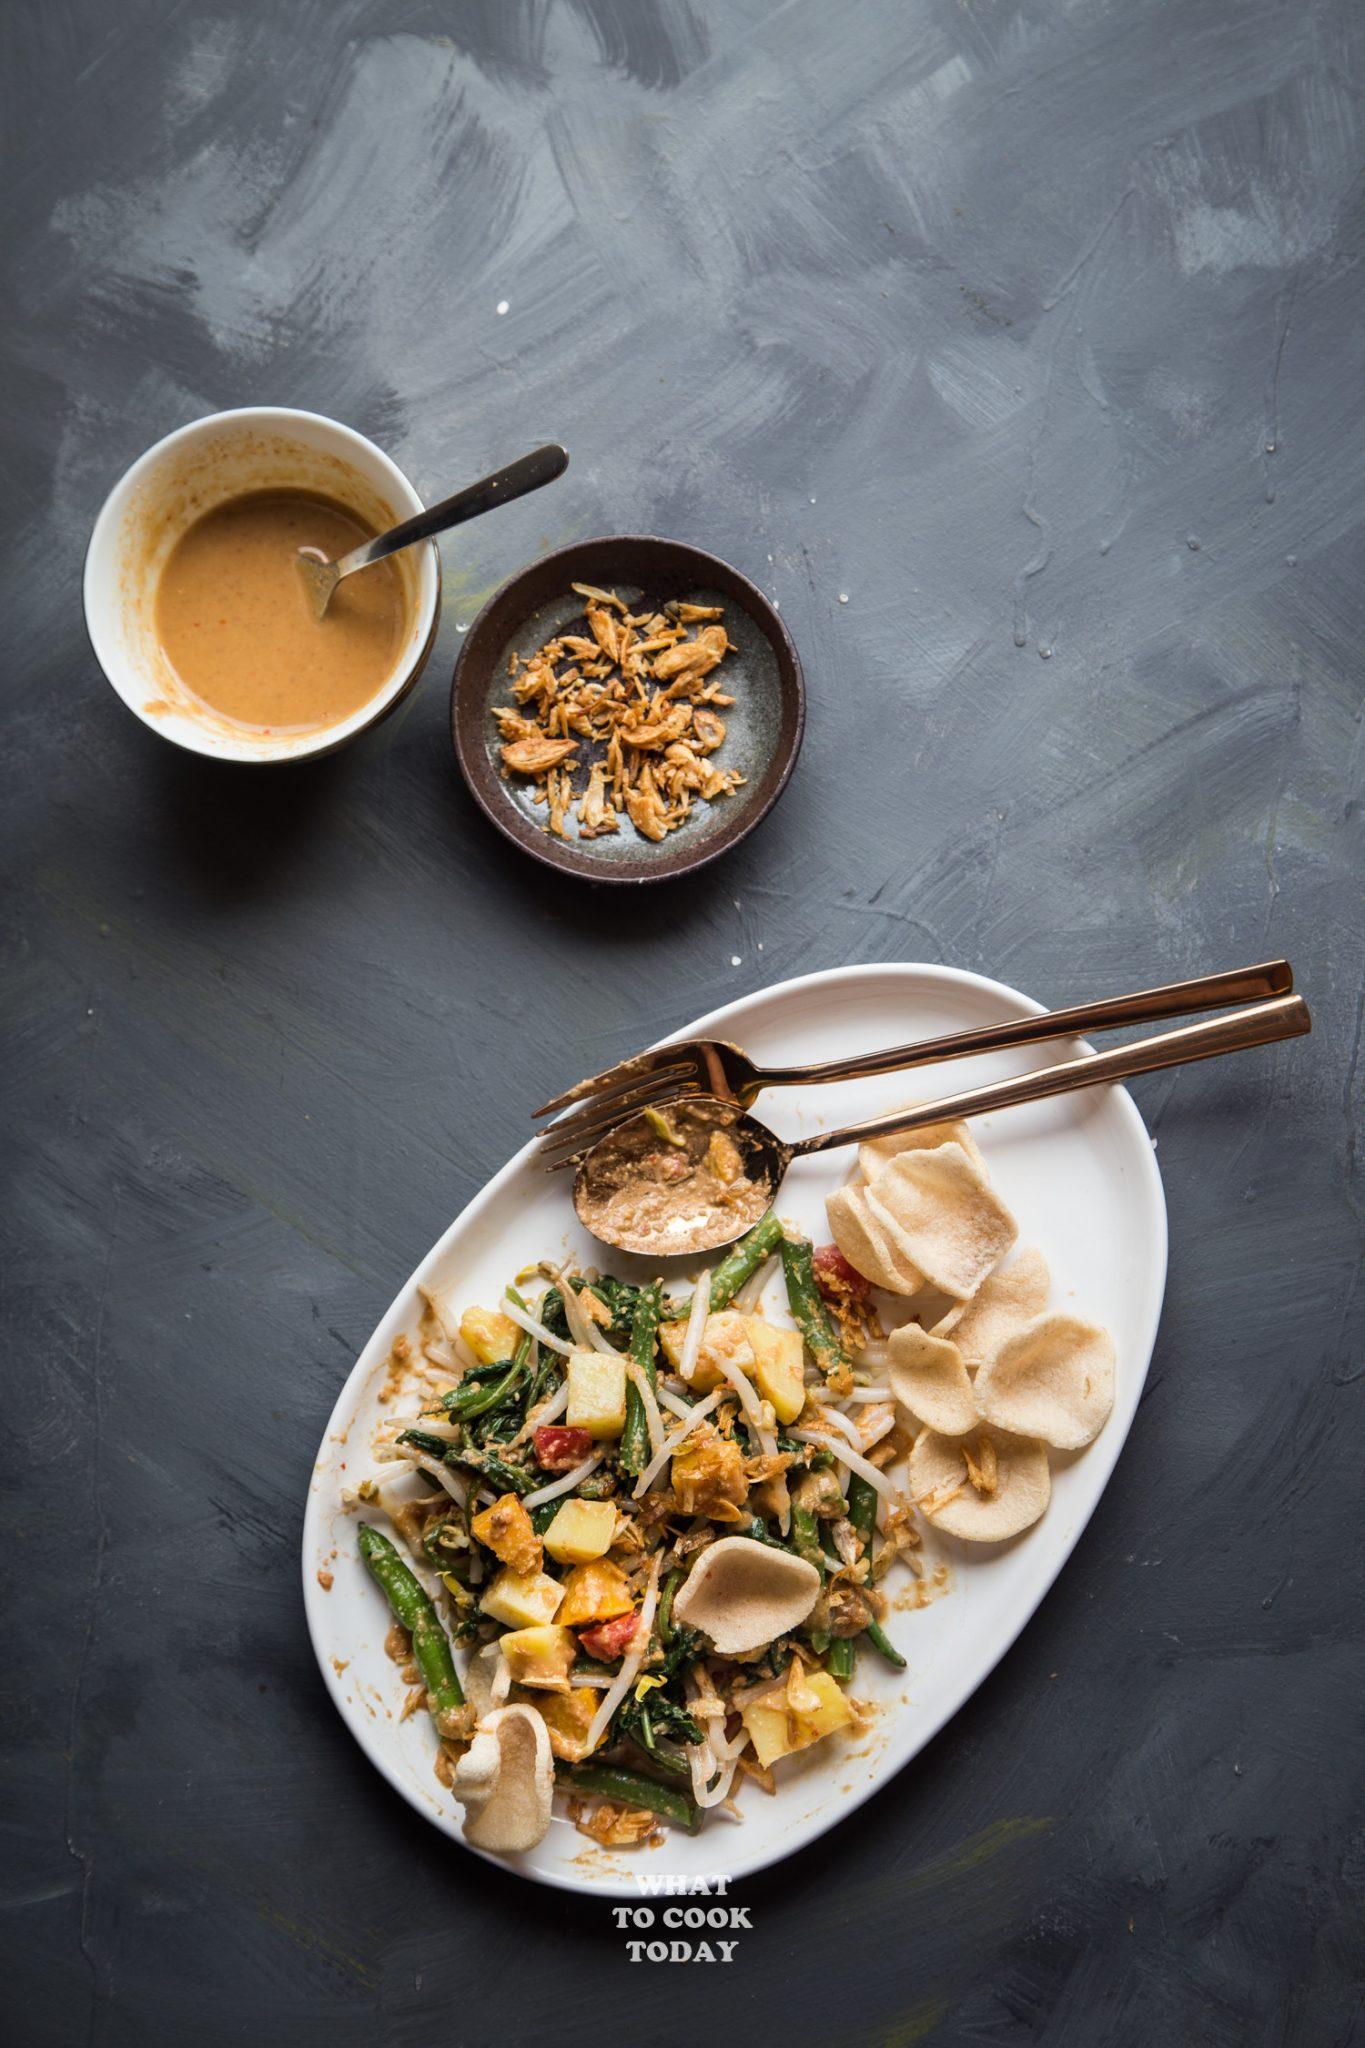 Lotek (Sundanese Vegetable Salad with Peanut Dressing) #salad #lotek #indonesianrecipe #asianrecipe